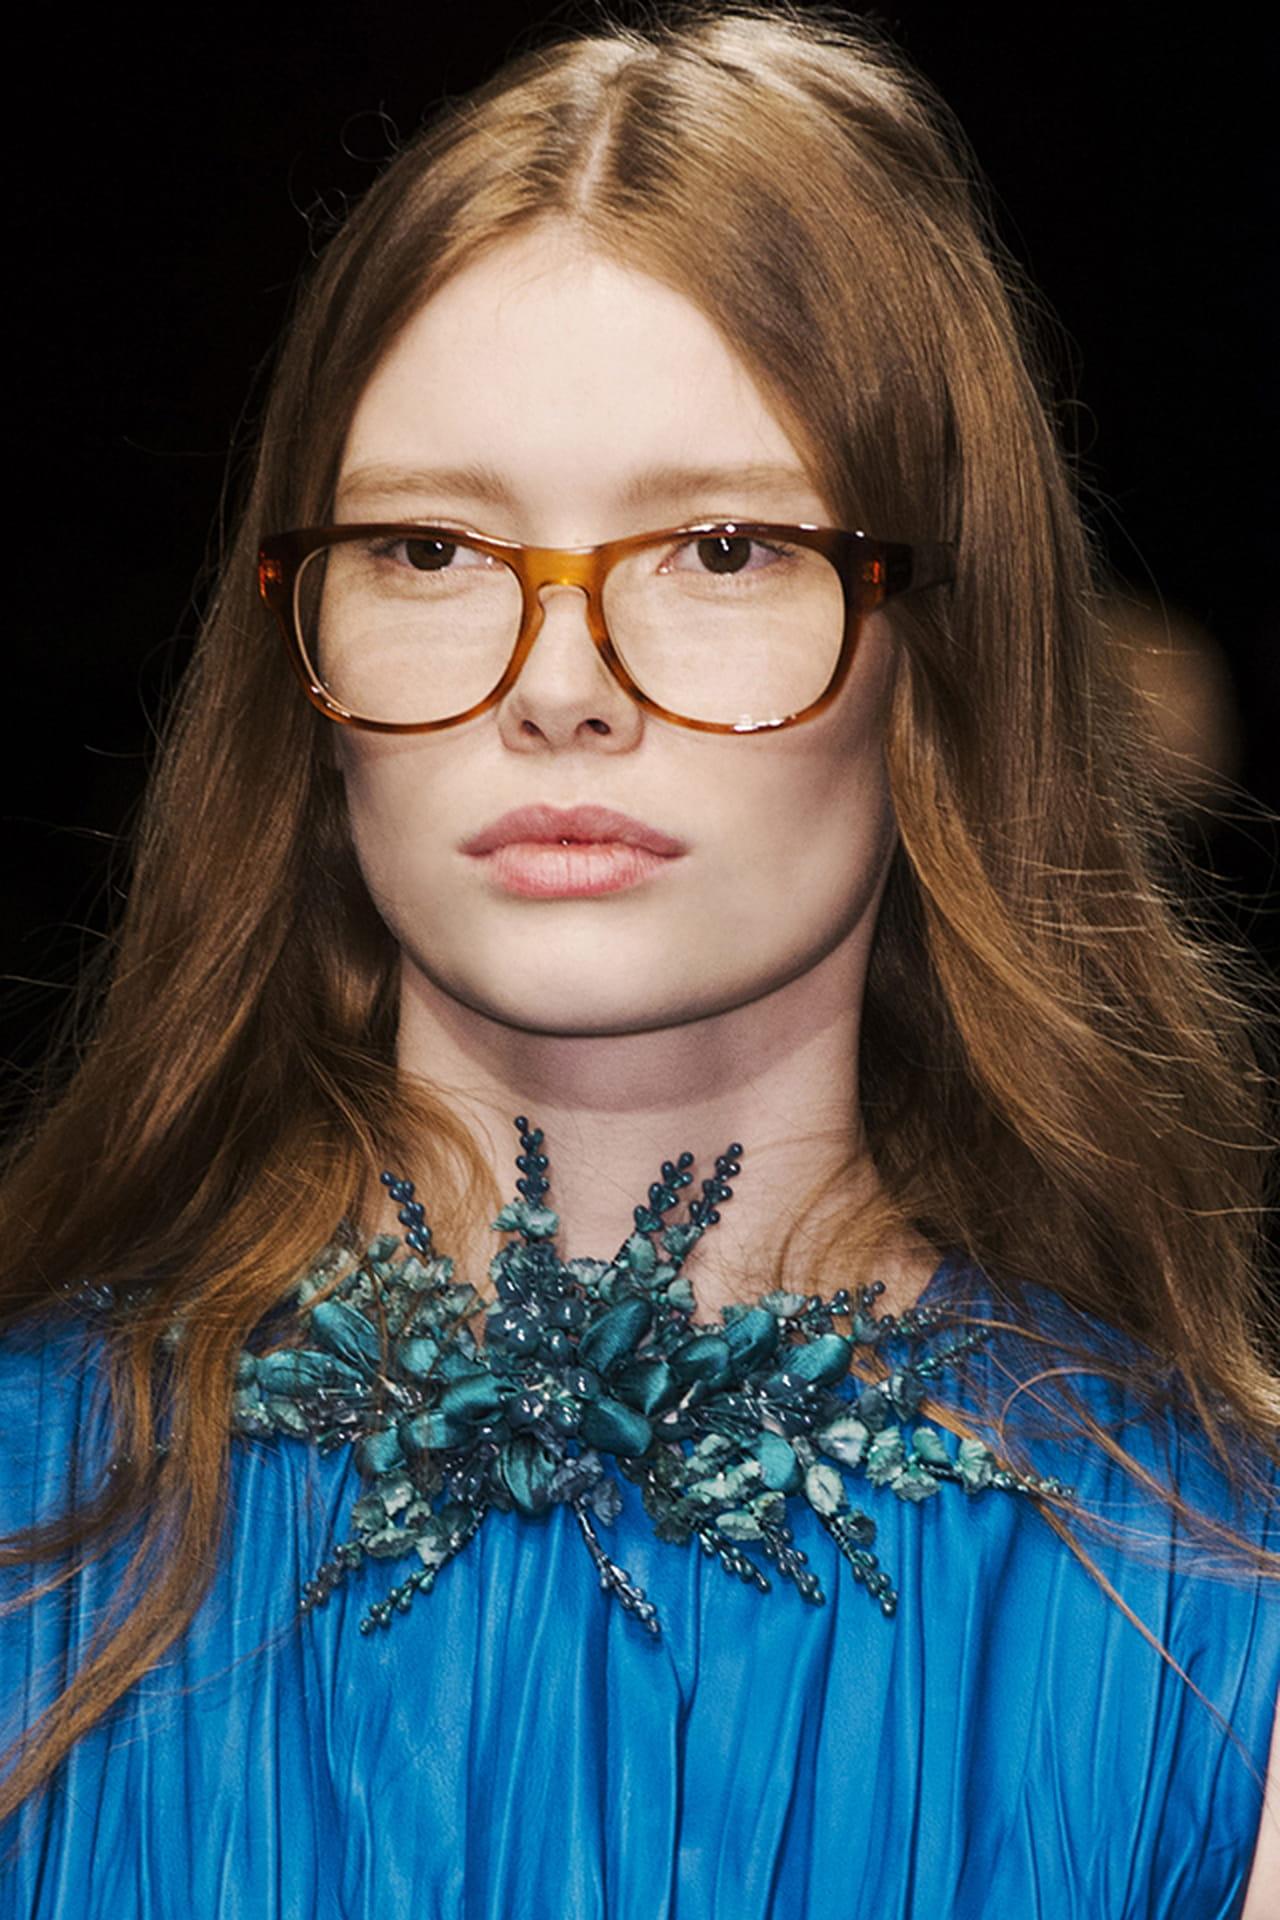 630d88fd8 Descubra o modelo de óculos de grau ideal para seu tipo de rosto